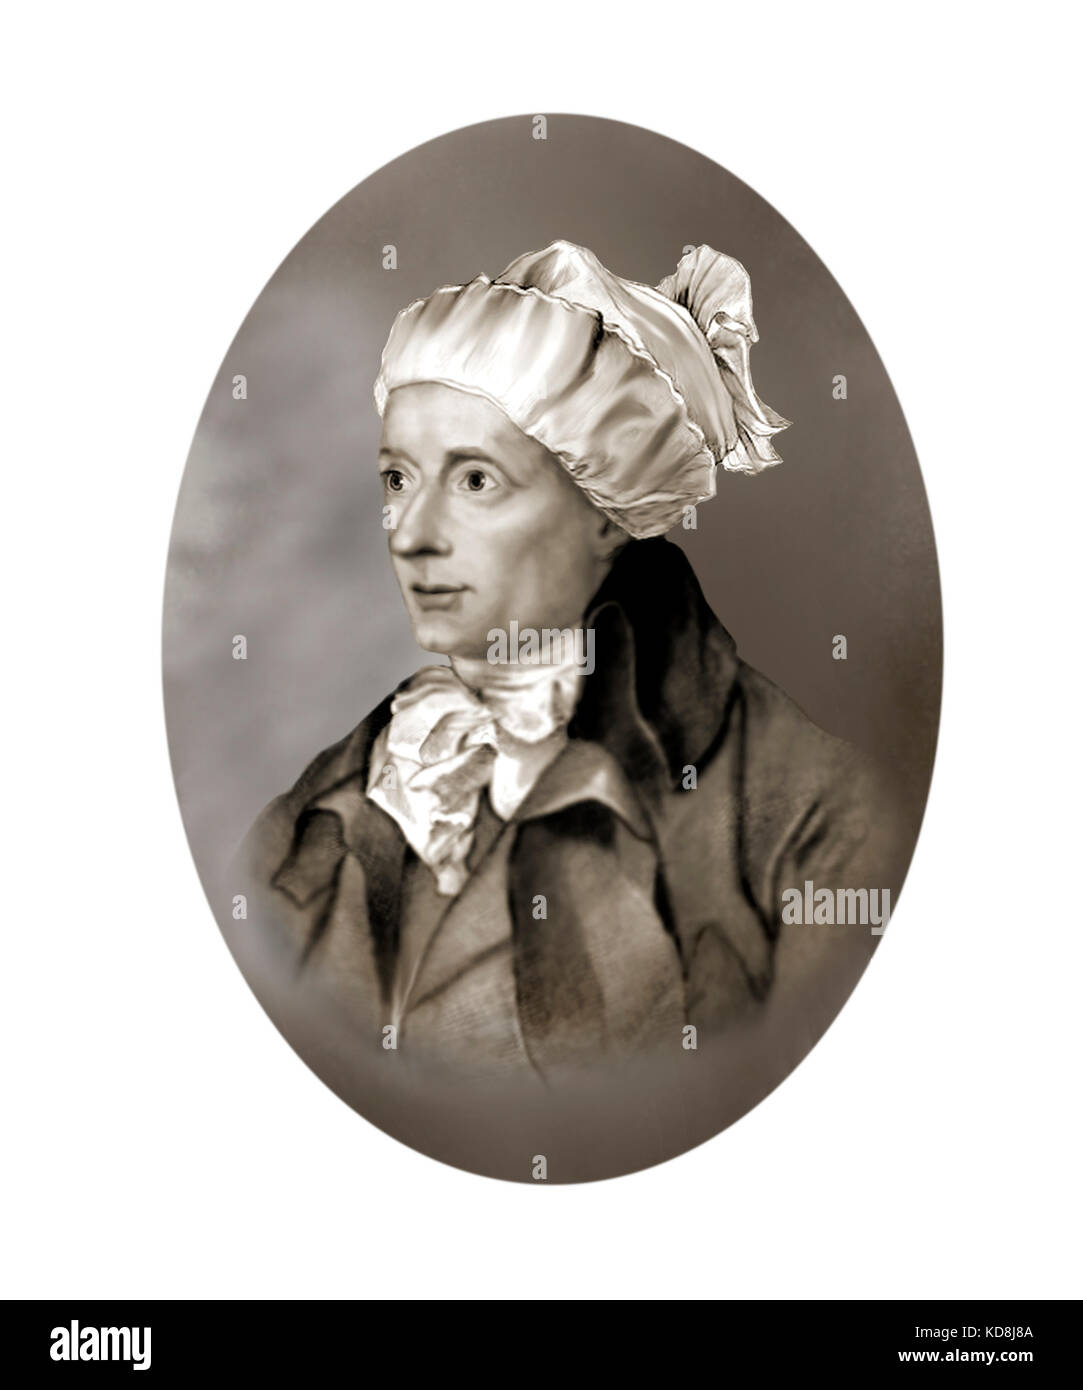 William Cowper, 1731 - 1800, English Poet. Hymnodist - Stock Image